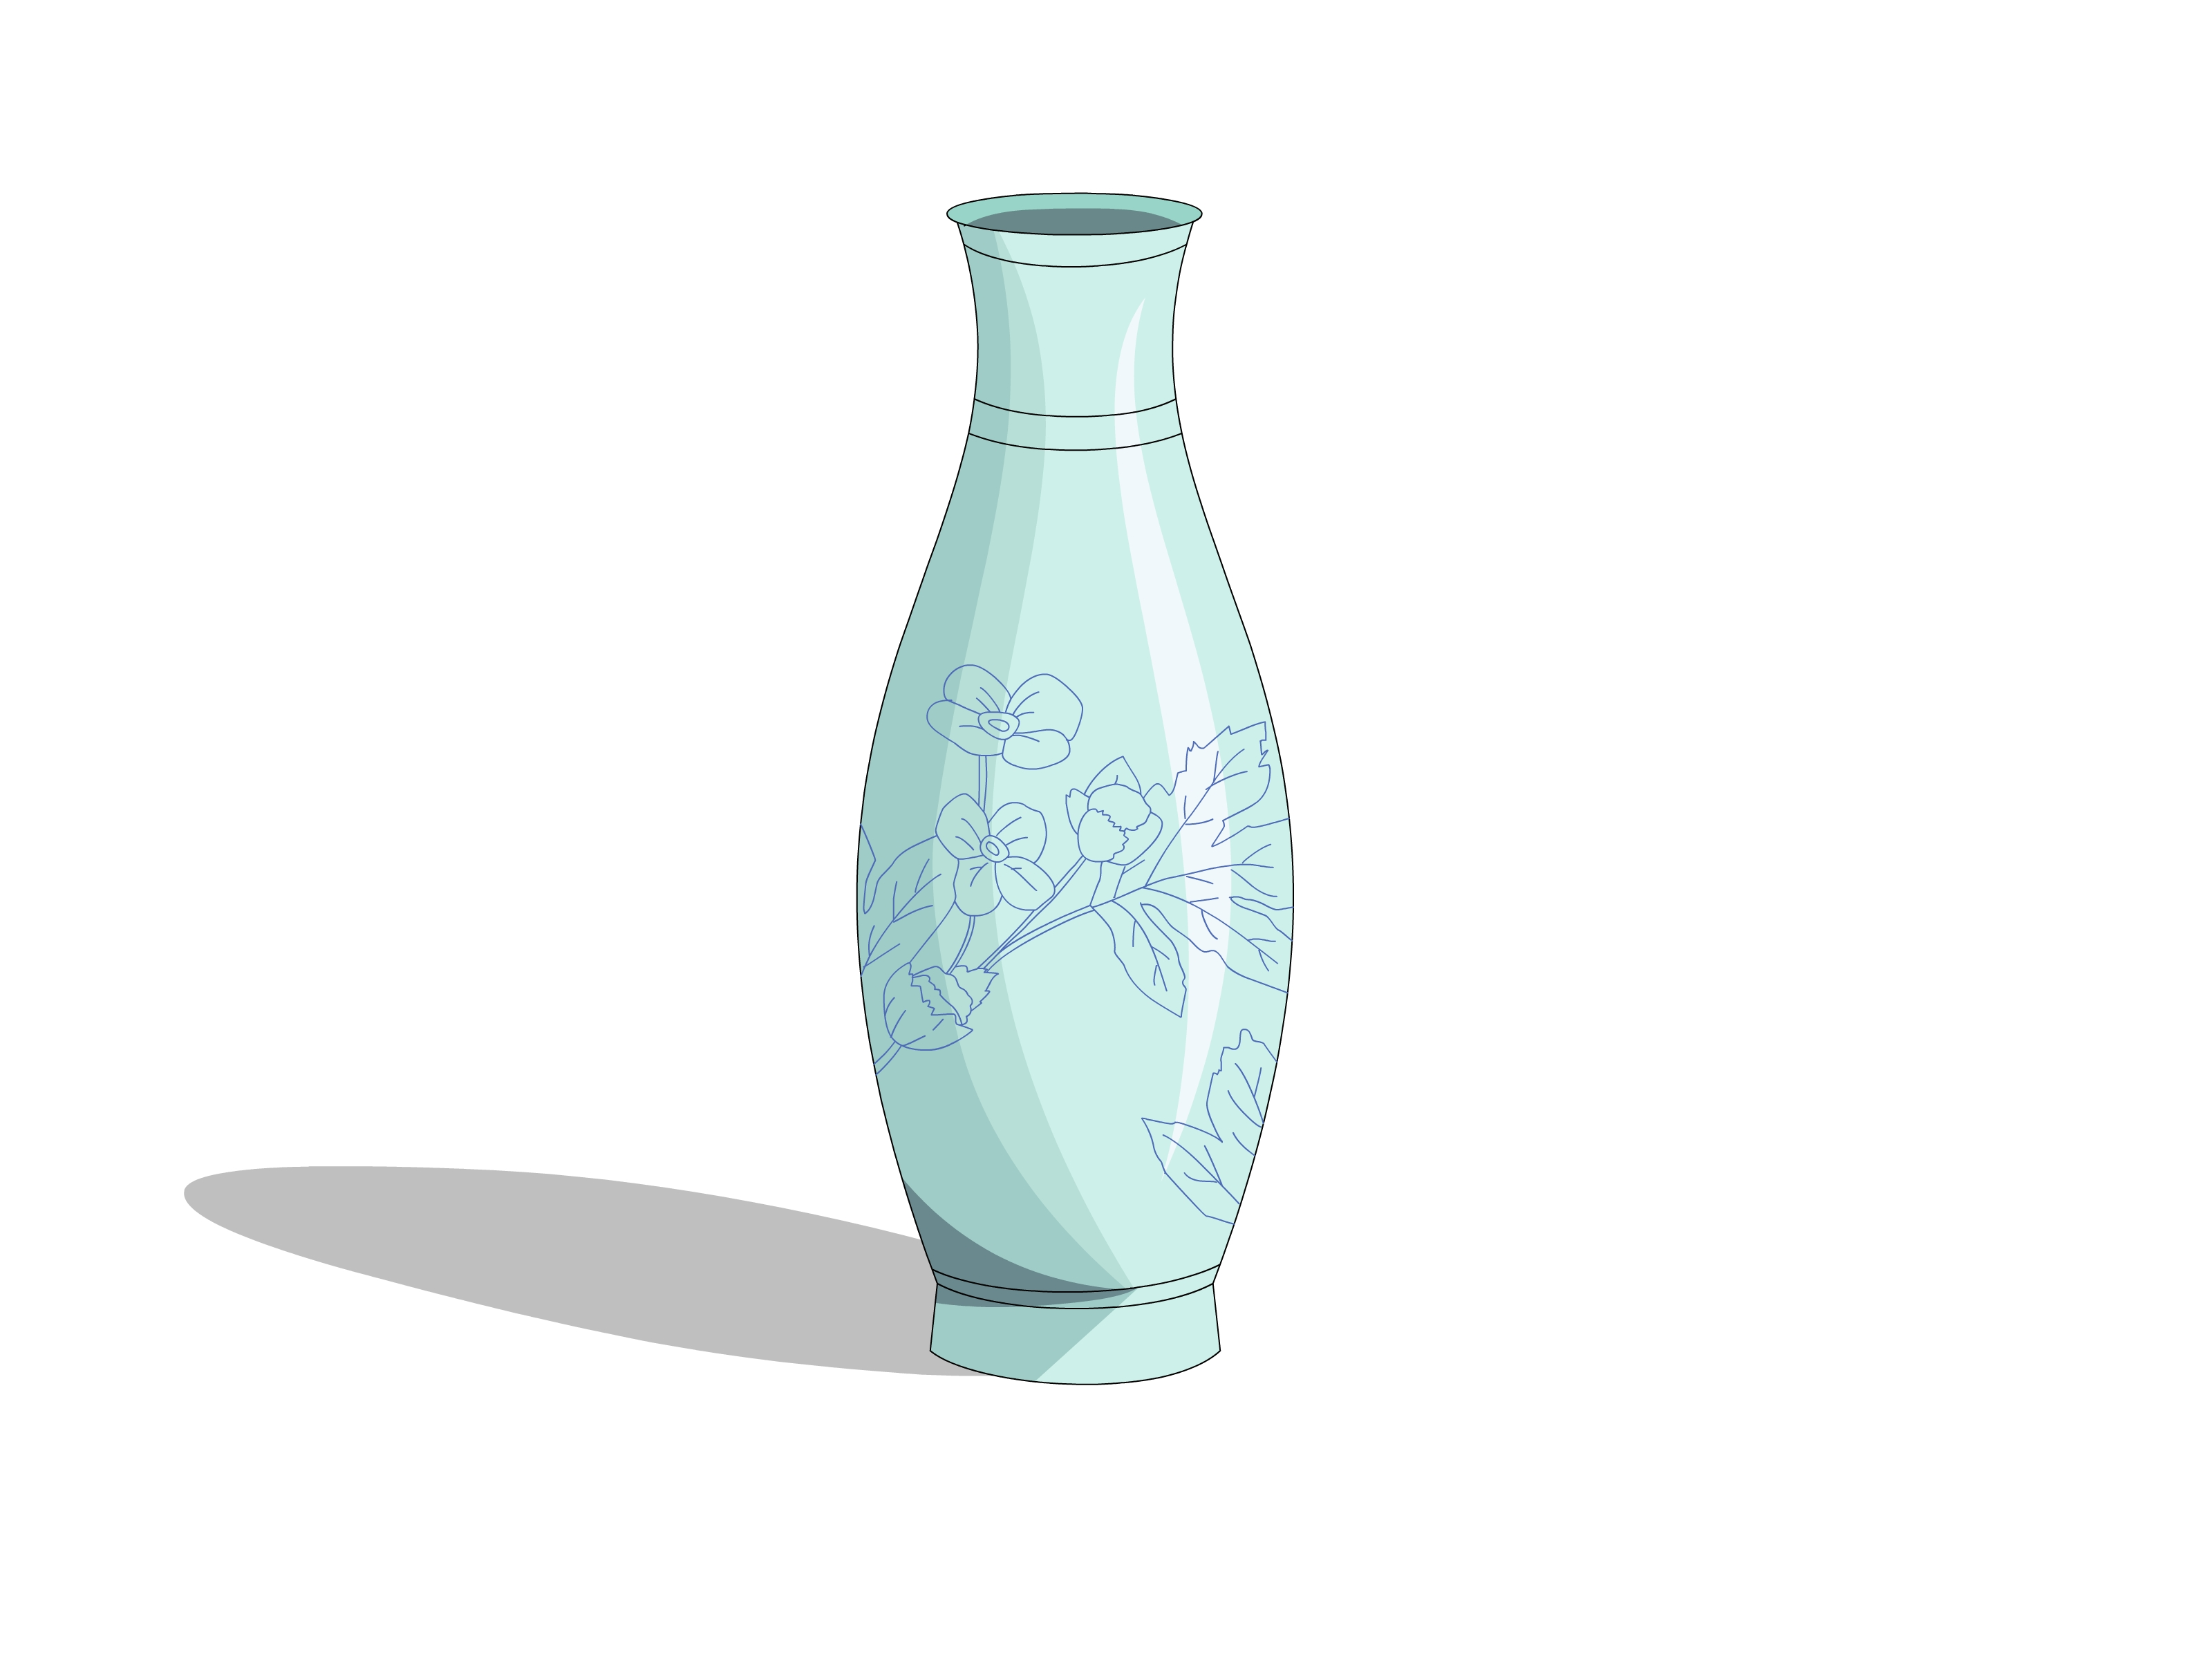 3200x2400 Flower Vase Drawing Step Draw Version